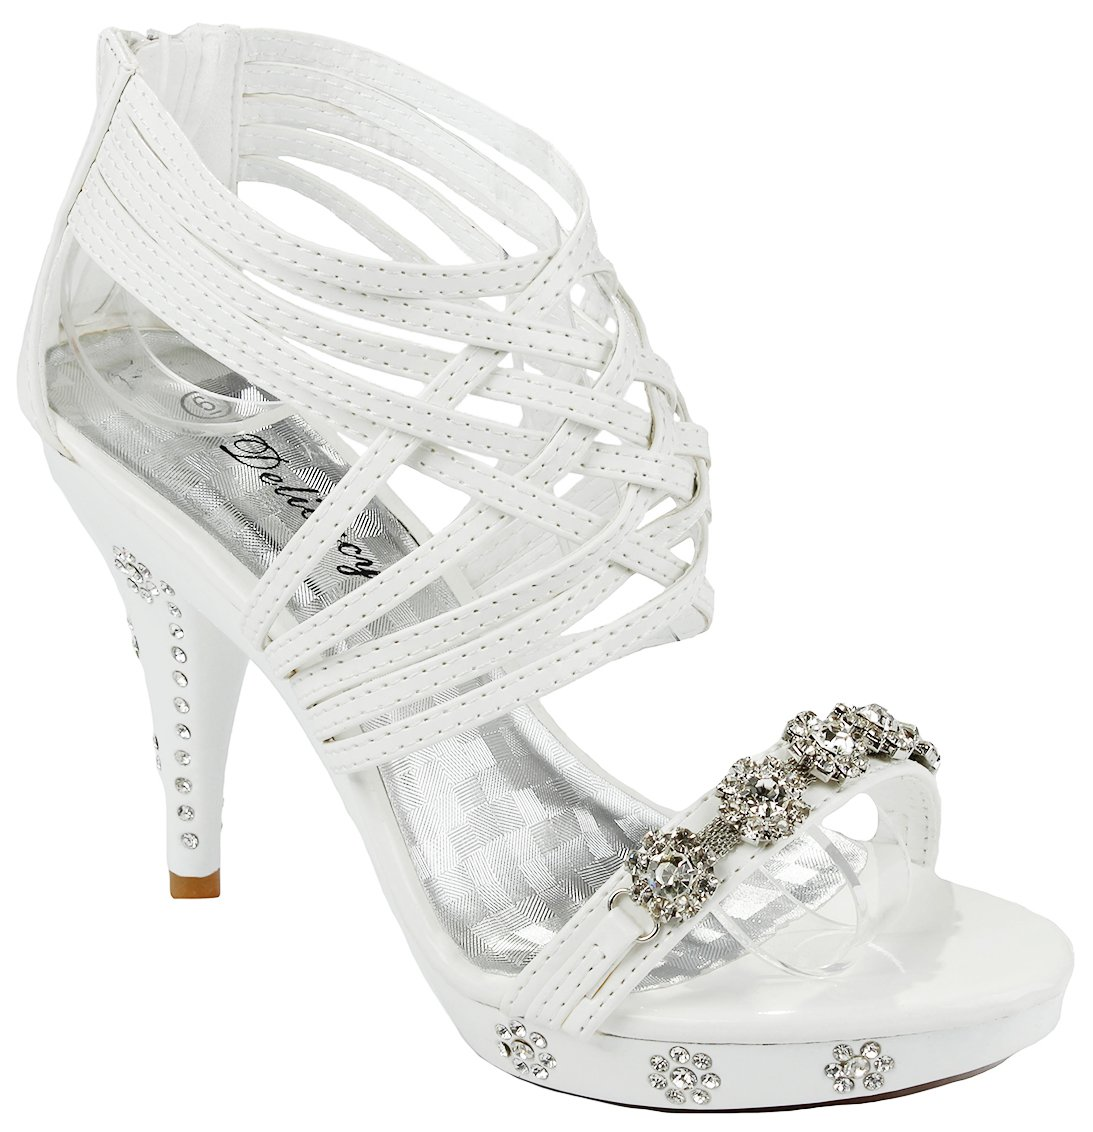 Women Strap Sparkle Rhinestone Strappy Zipper Open Toe Party Evening Dress Heels Sandal Pumps B074HH487H 7 B(M) US|White_t27